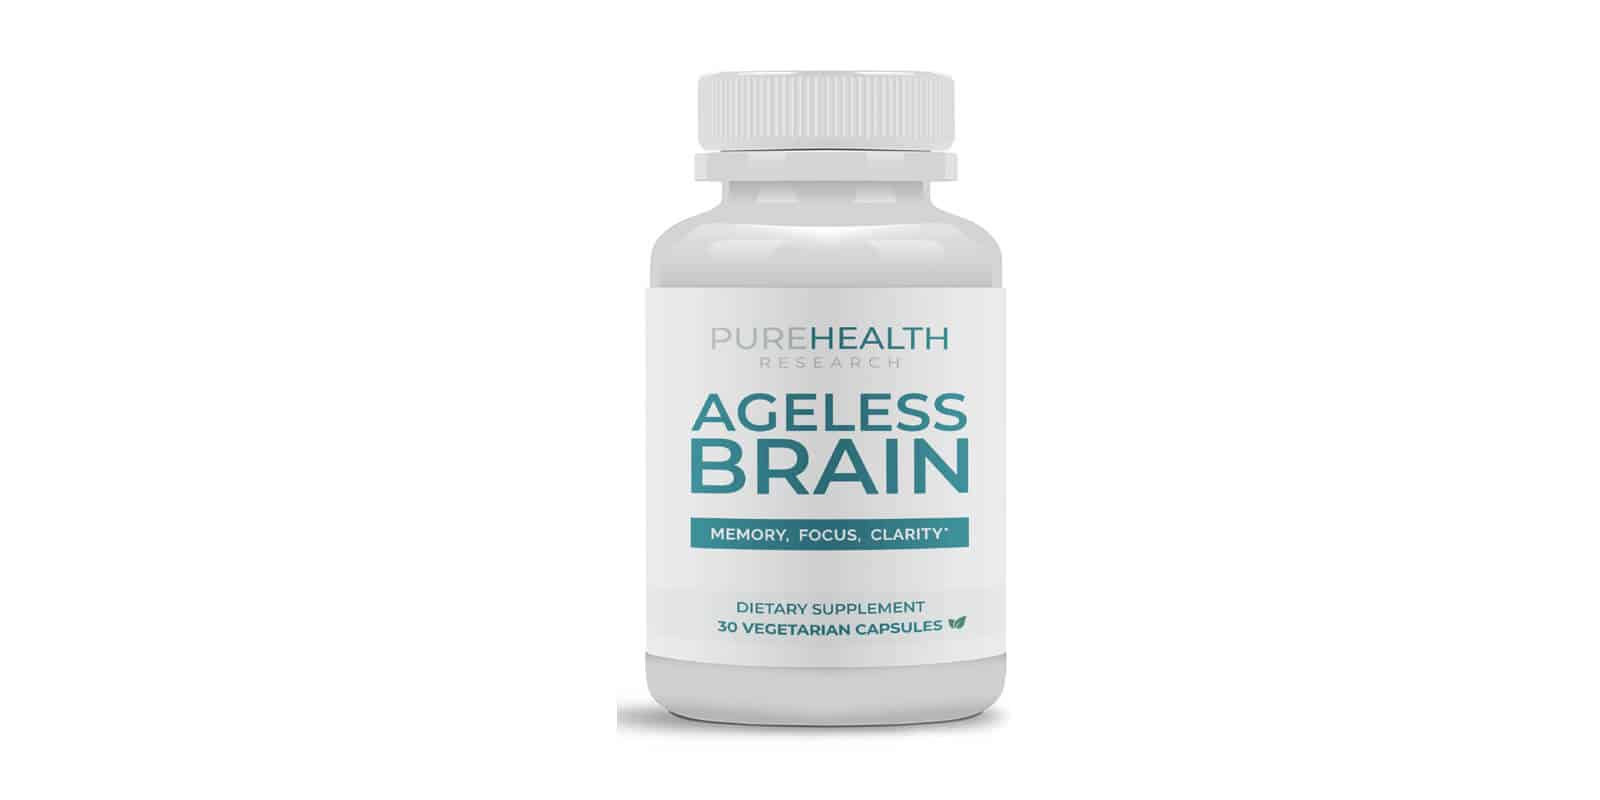 Ageless Brain Reviews